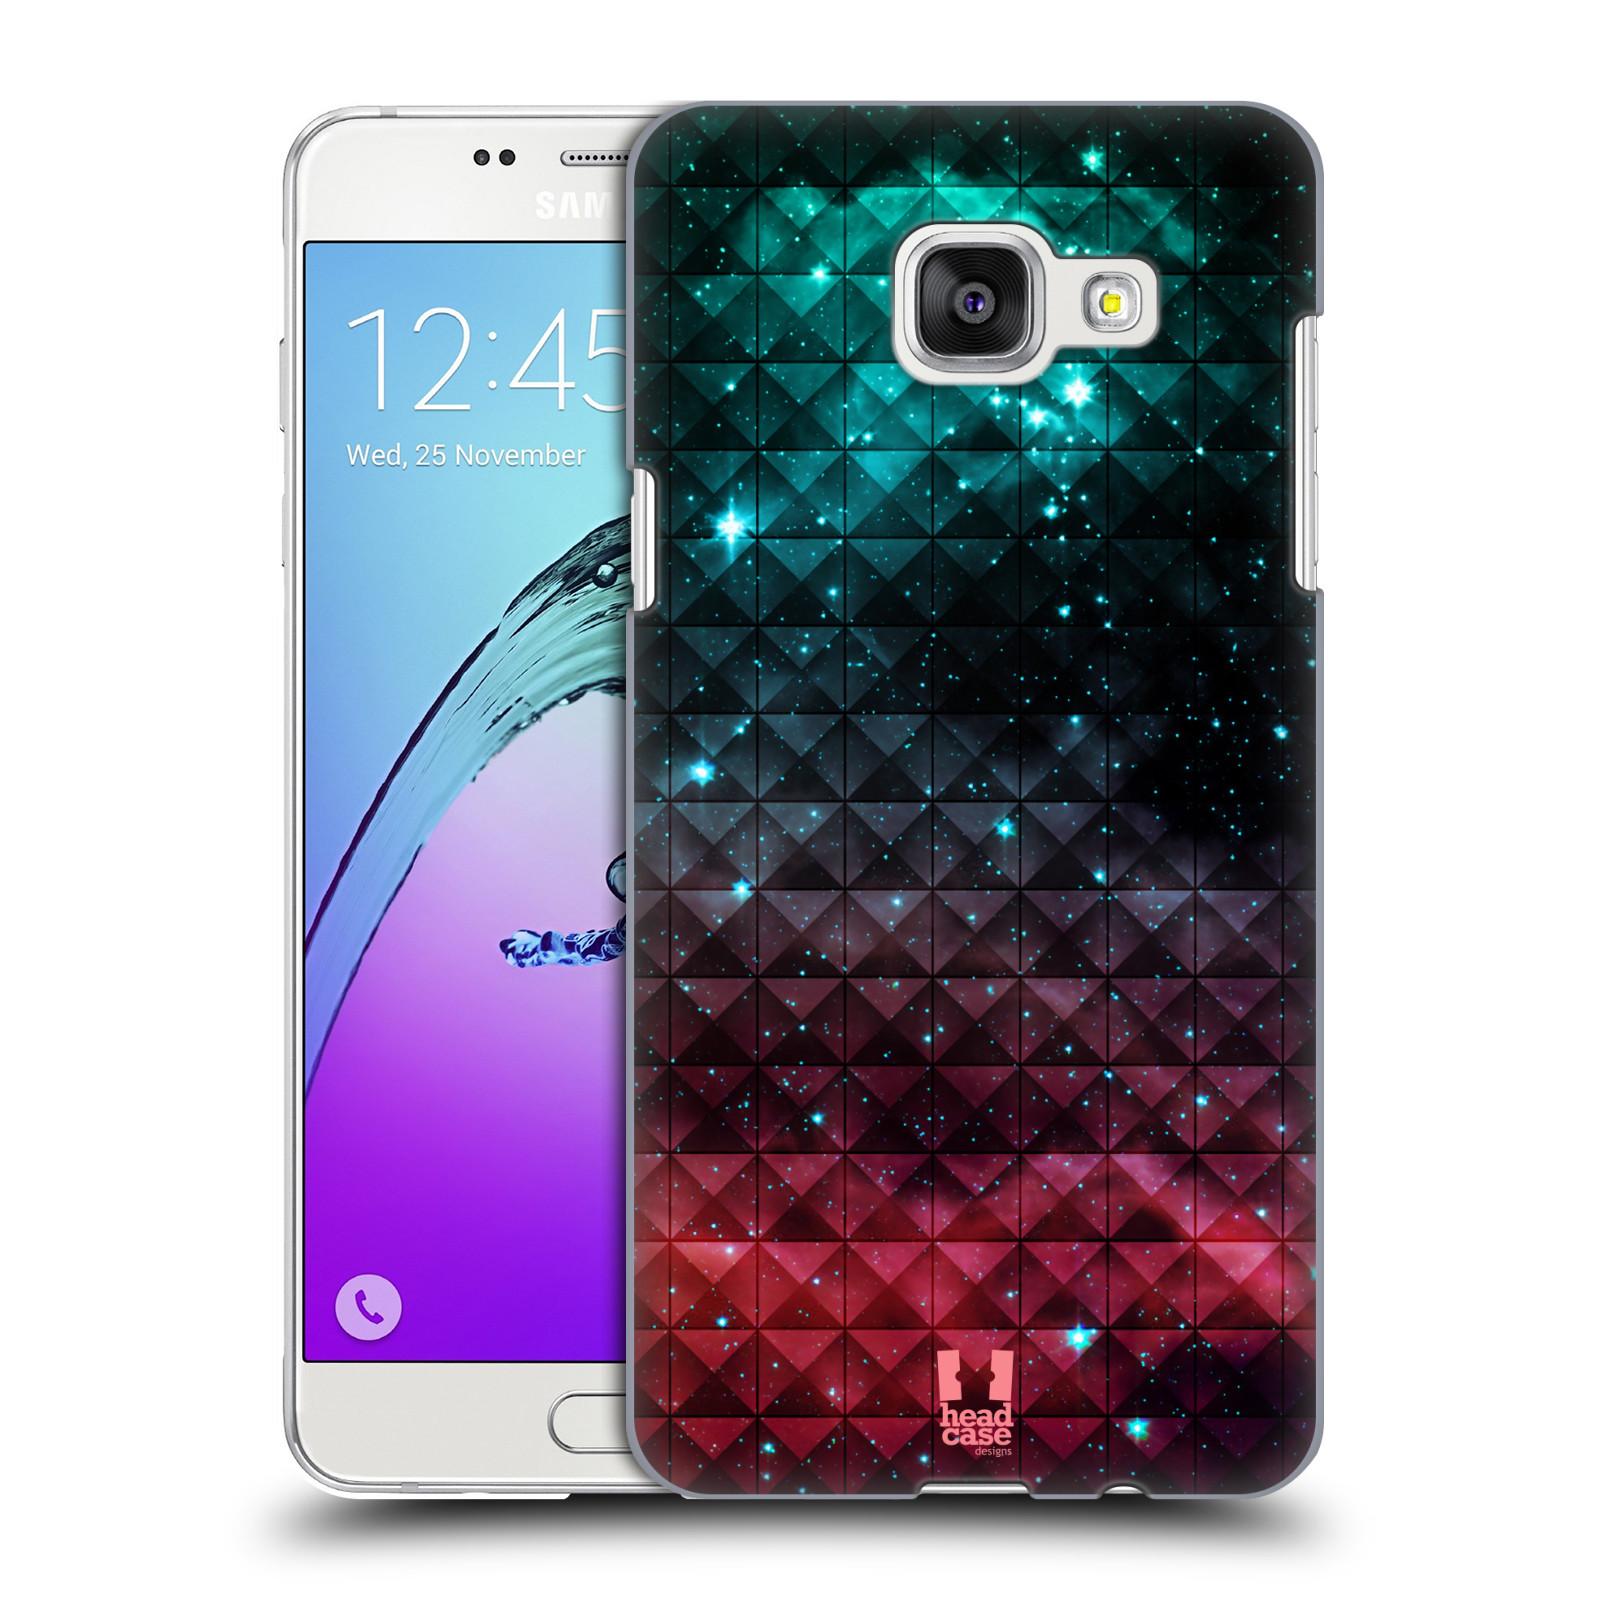 Plastové pouzdro na mobil Samsung Galaxy A5 (2016) HEAD CASE OMBRE SPARKLE